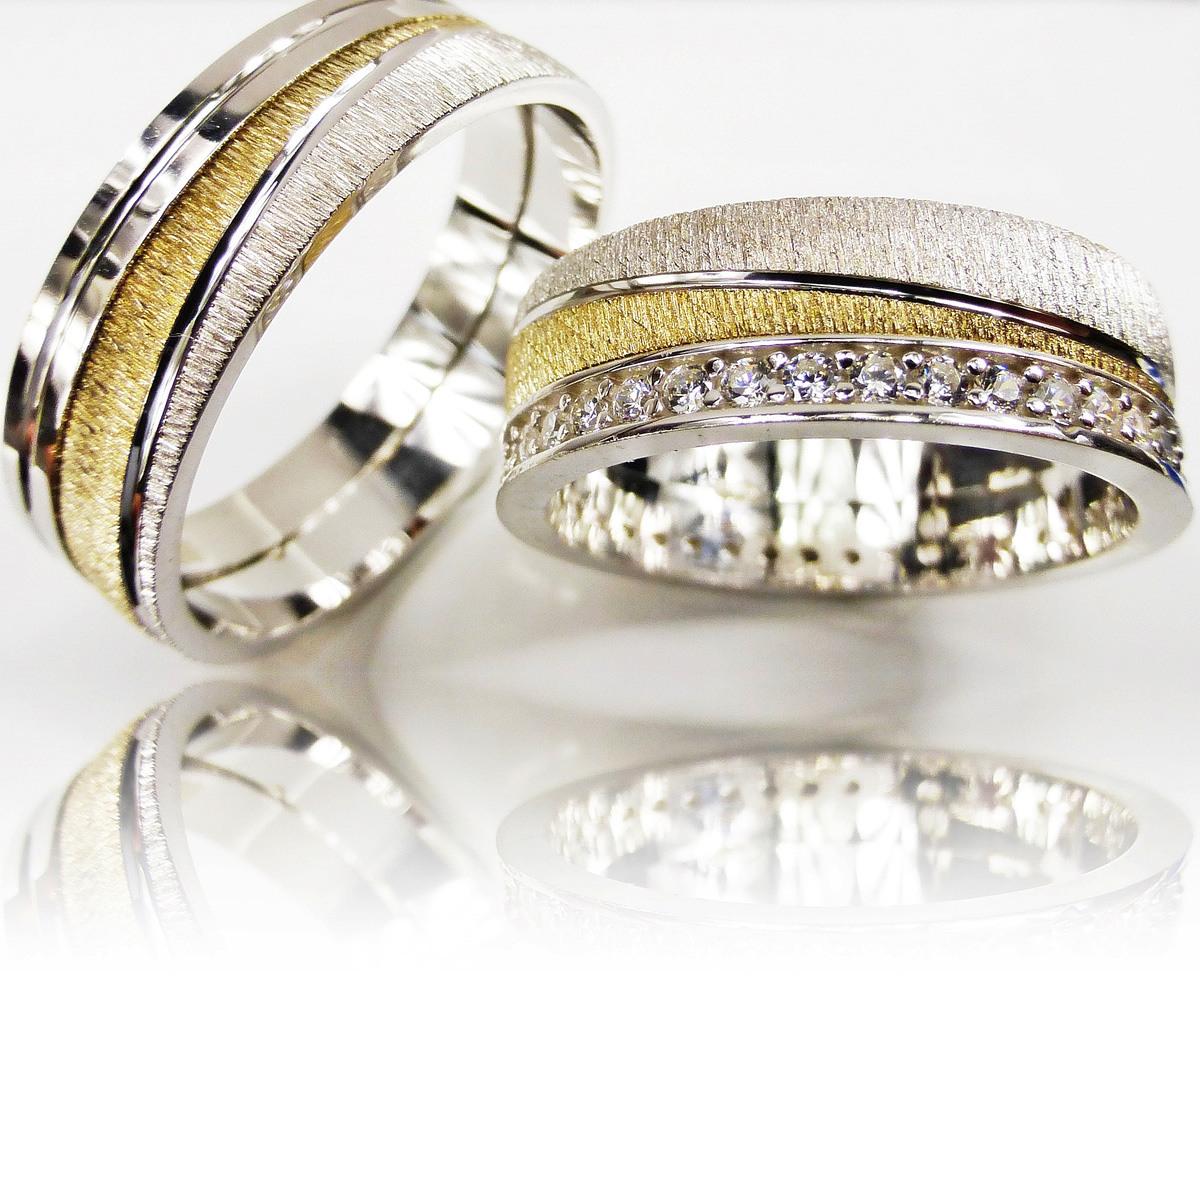 Details Zu 2 Trauringe 925 Silber Gravur + Etui Eheringe Verlobungsringe  Partnerringe 3311